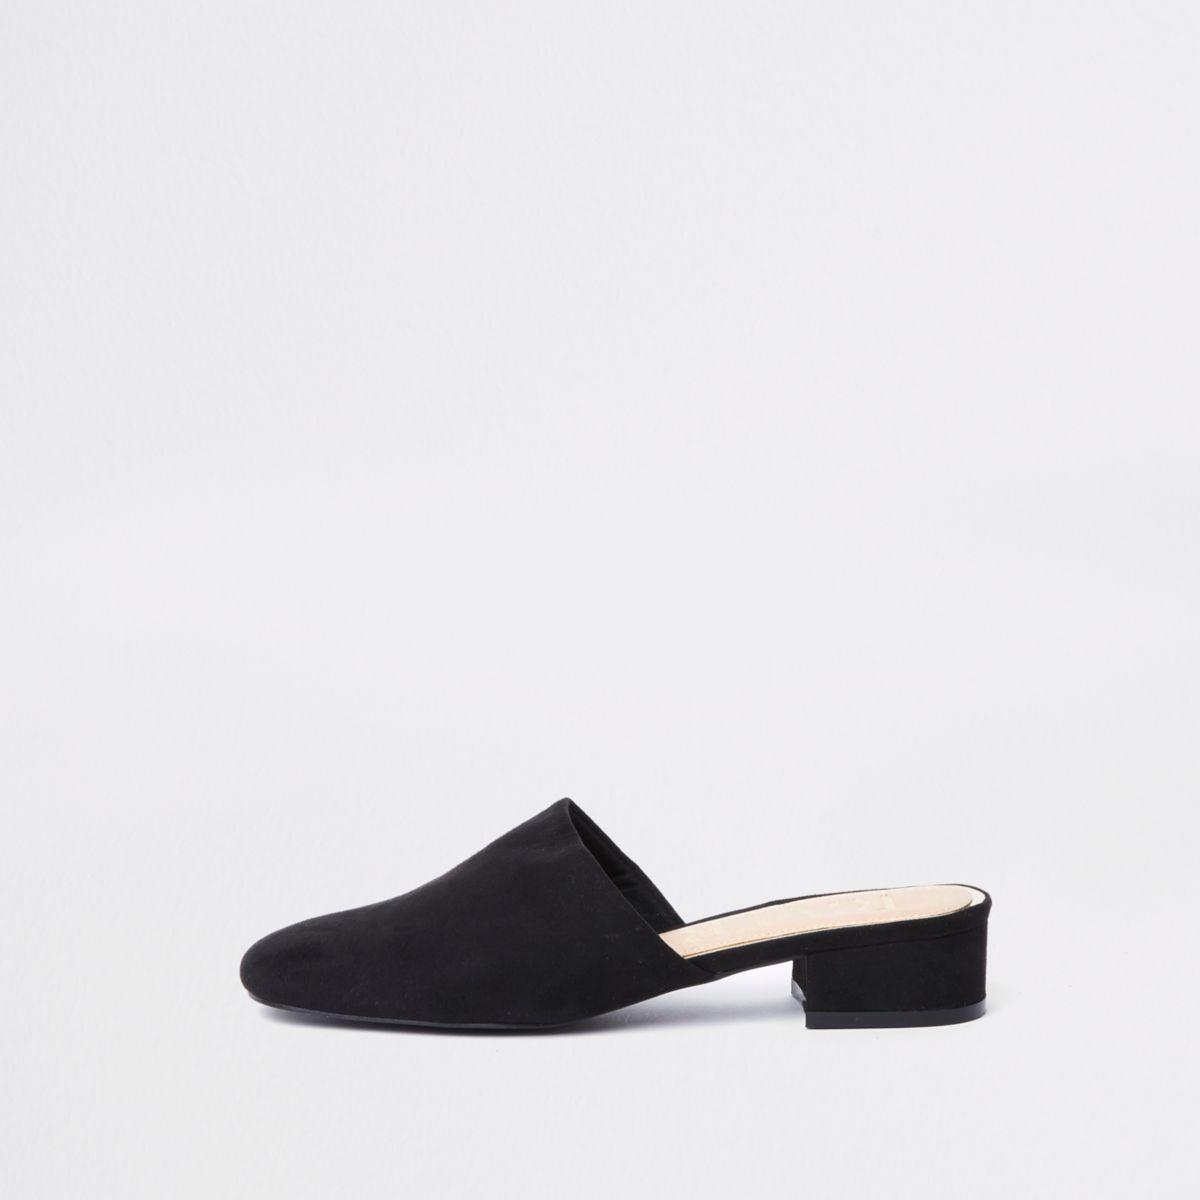 Black faux suede backless loafer